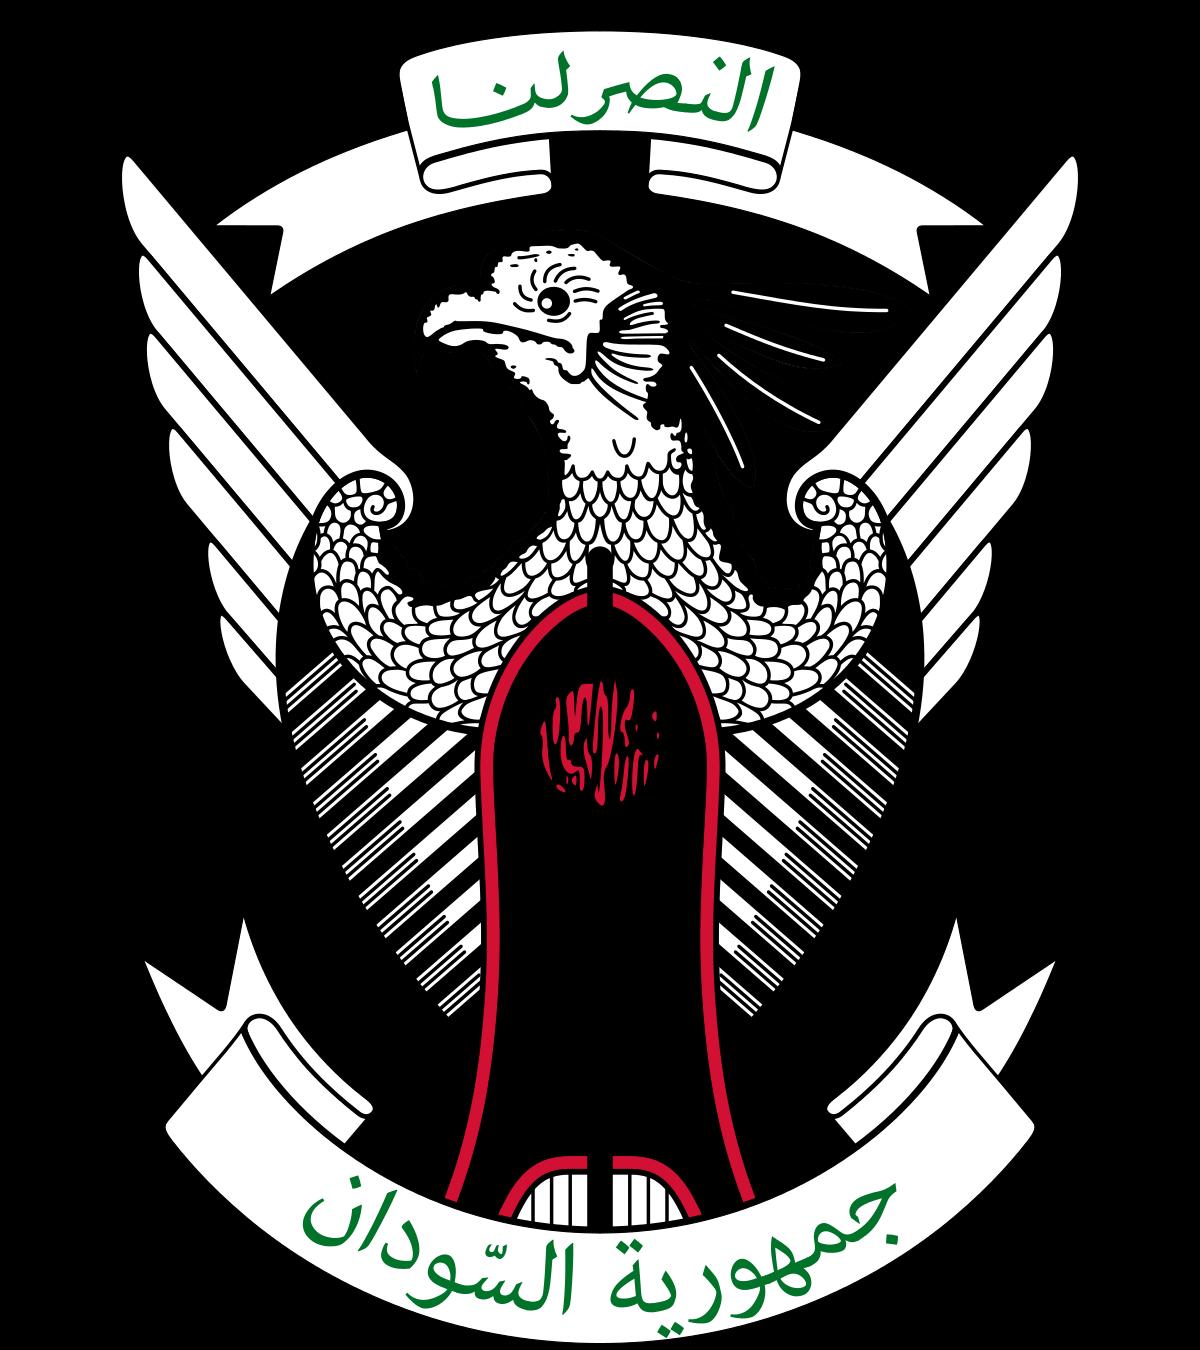 vector transparent library Politics of sudan wikipedia. Wars clipart military dictatorship